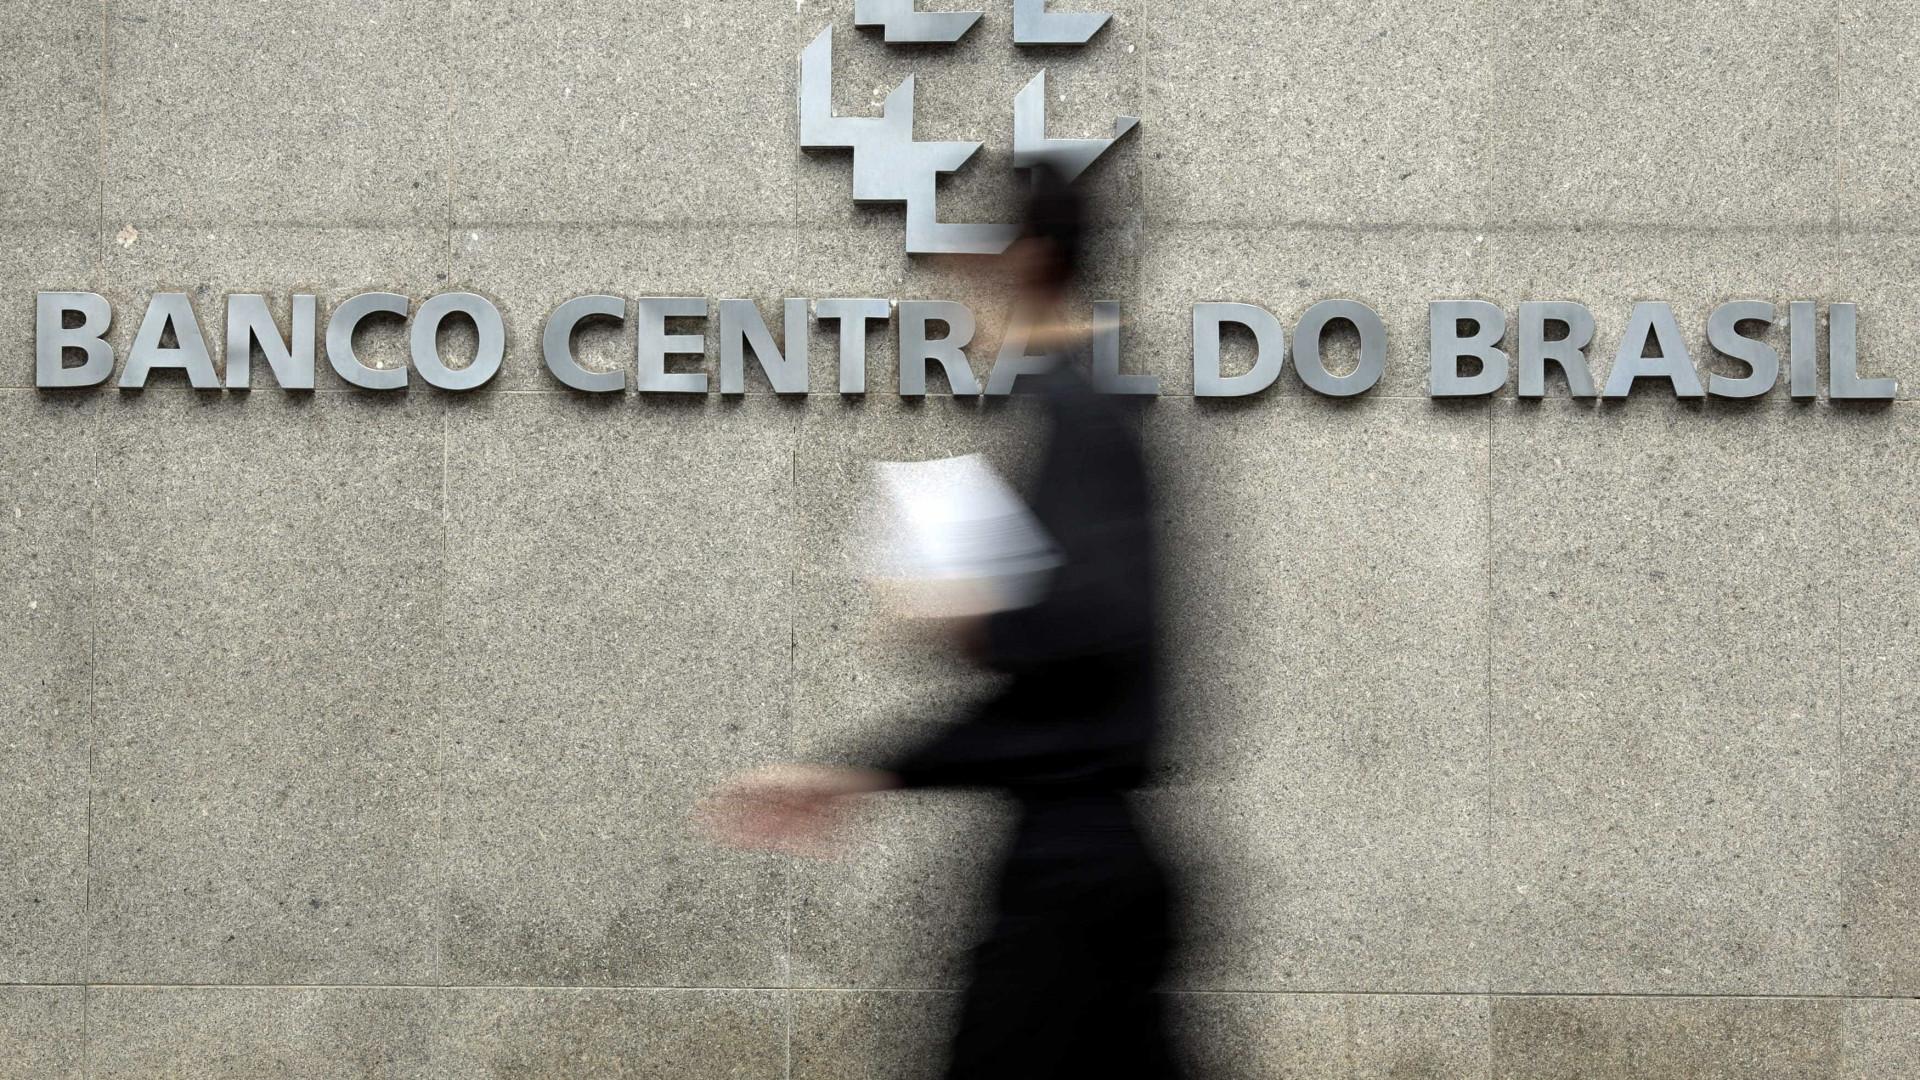 Saiba quem é Roberto Campos Neto, o novo presidente do Banco Central